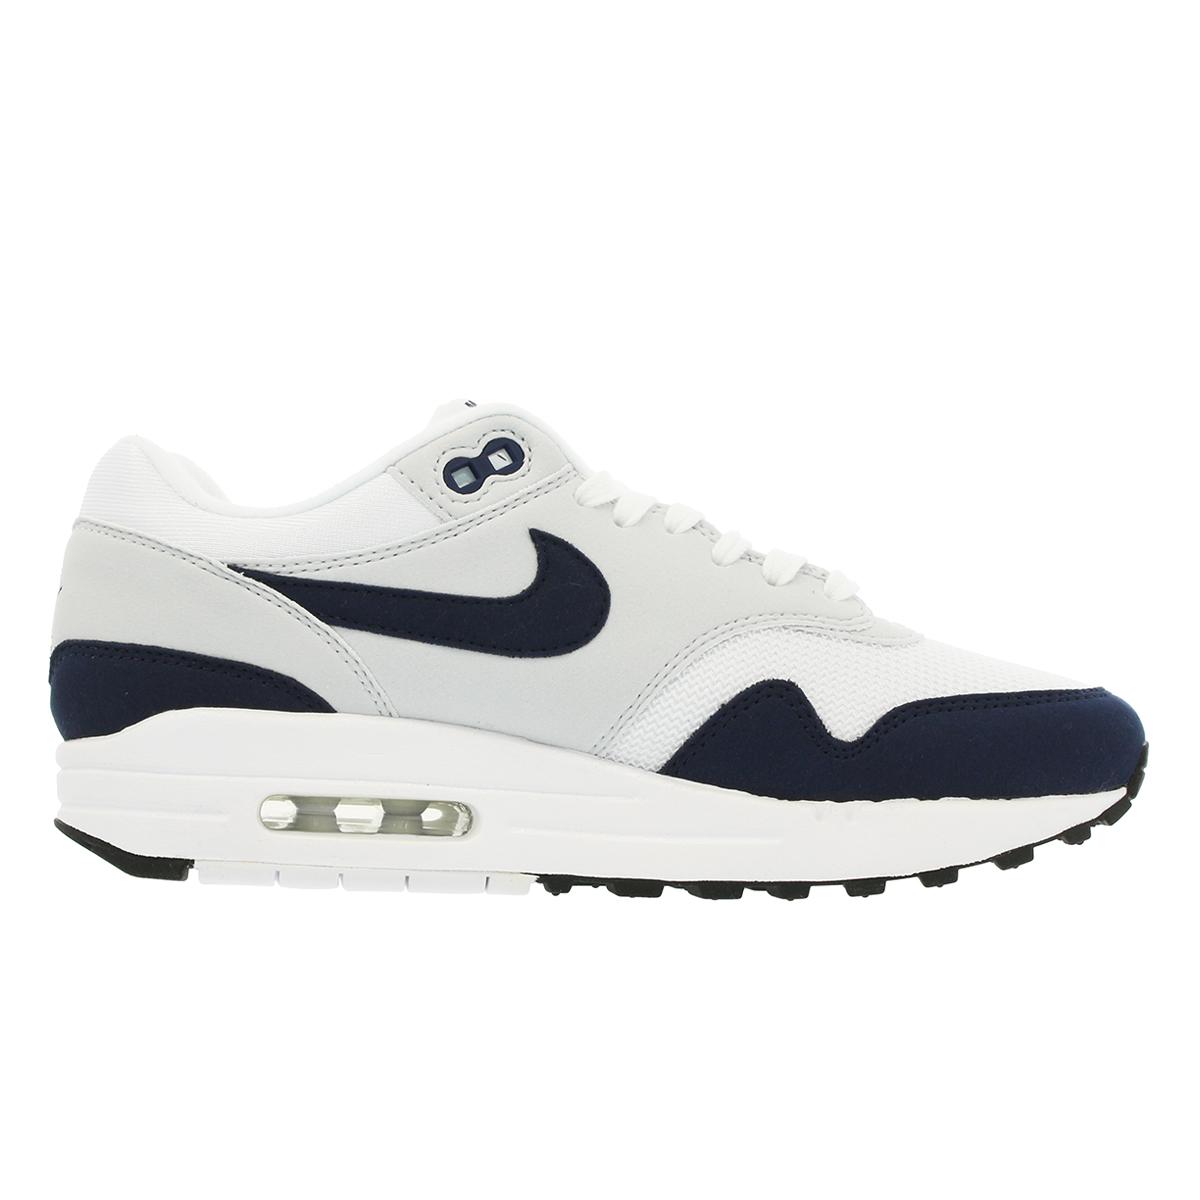 lowest price 716d3 f7661 NIKE WMNS AIR MAX 1 Nike women Air Max 1 WHITE OBSIDIAN PURE PLATINUM BLACK  319,986-104